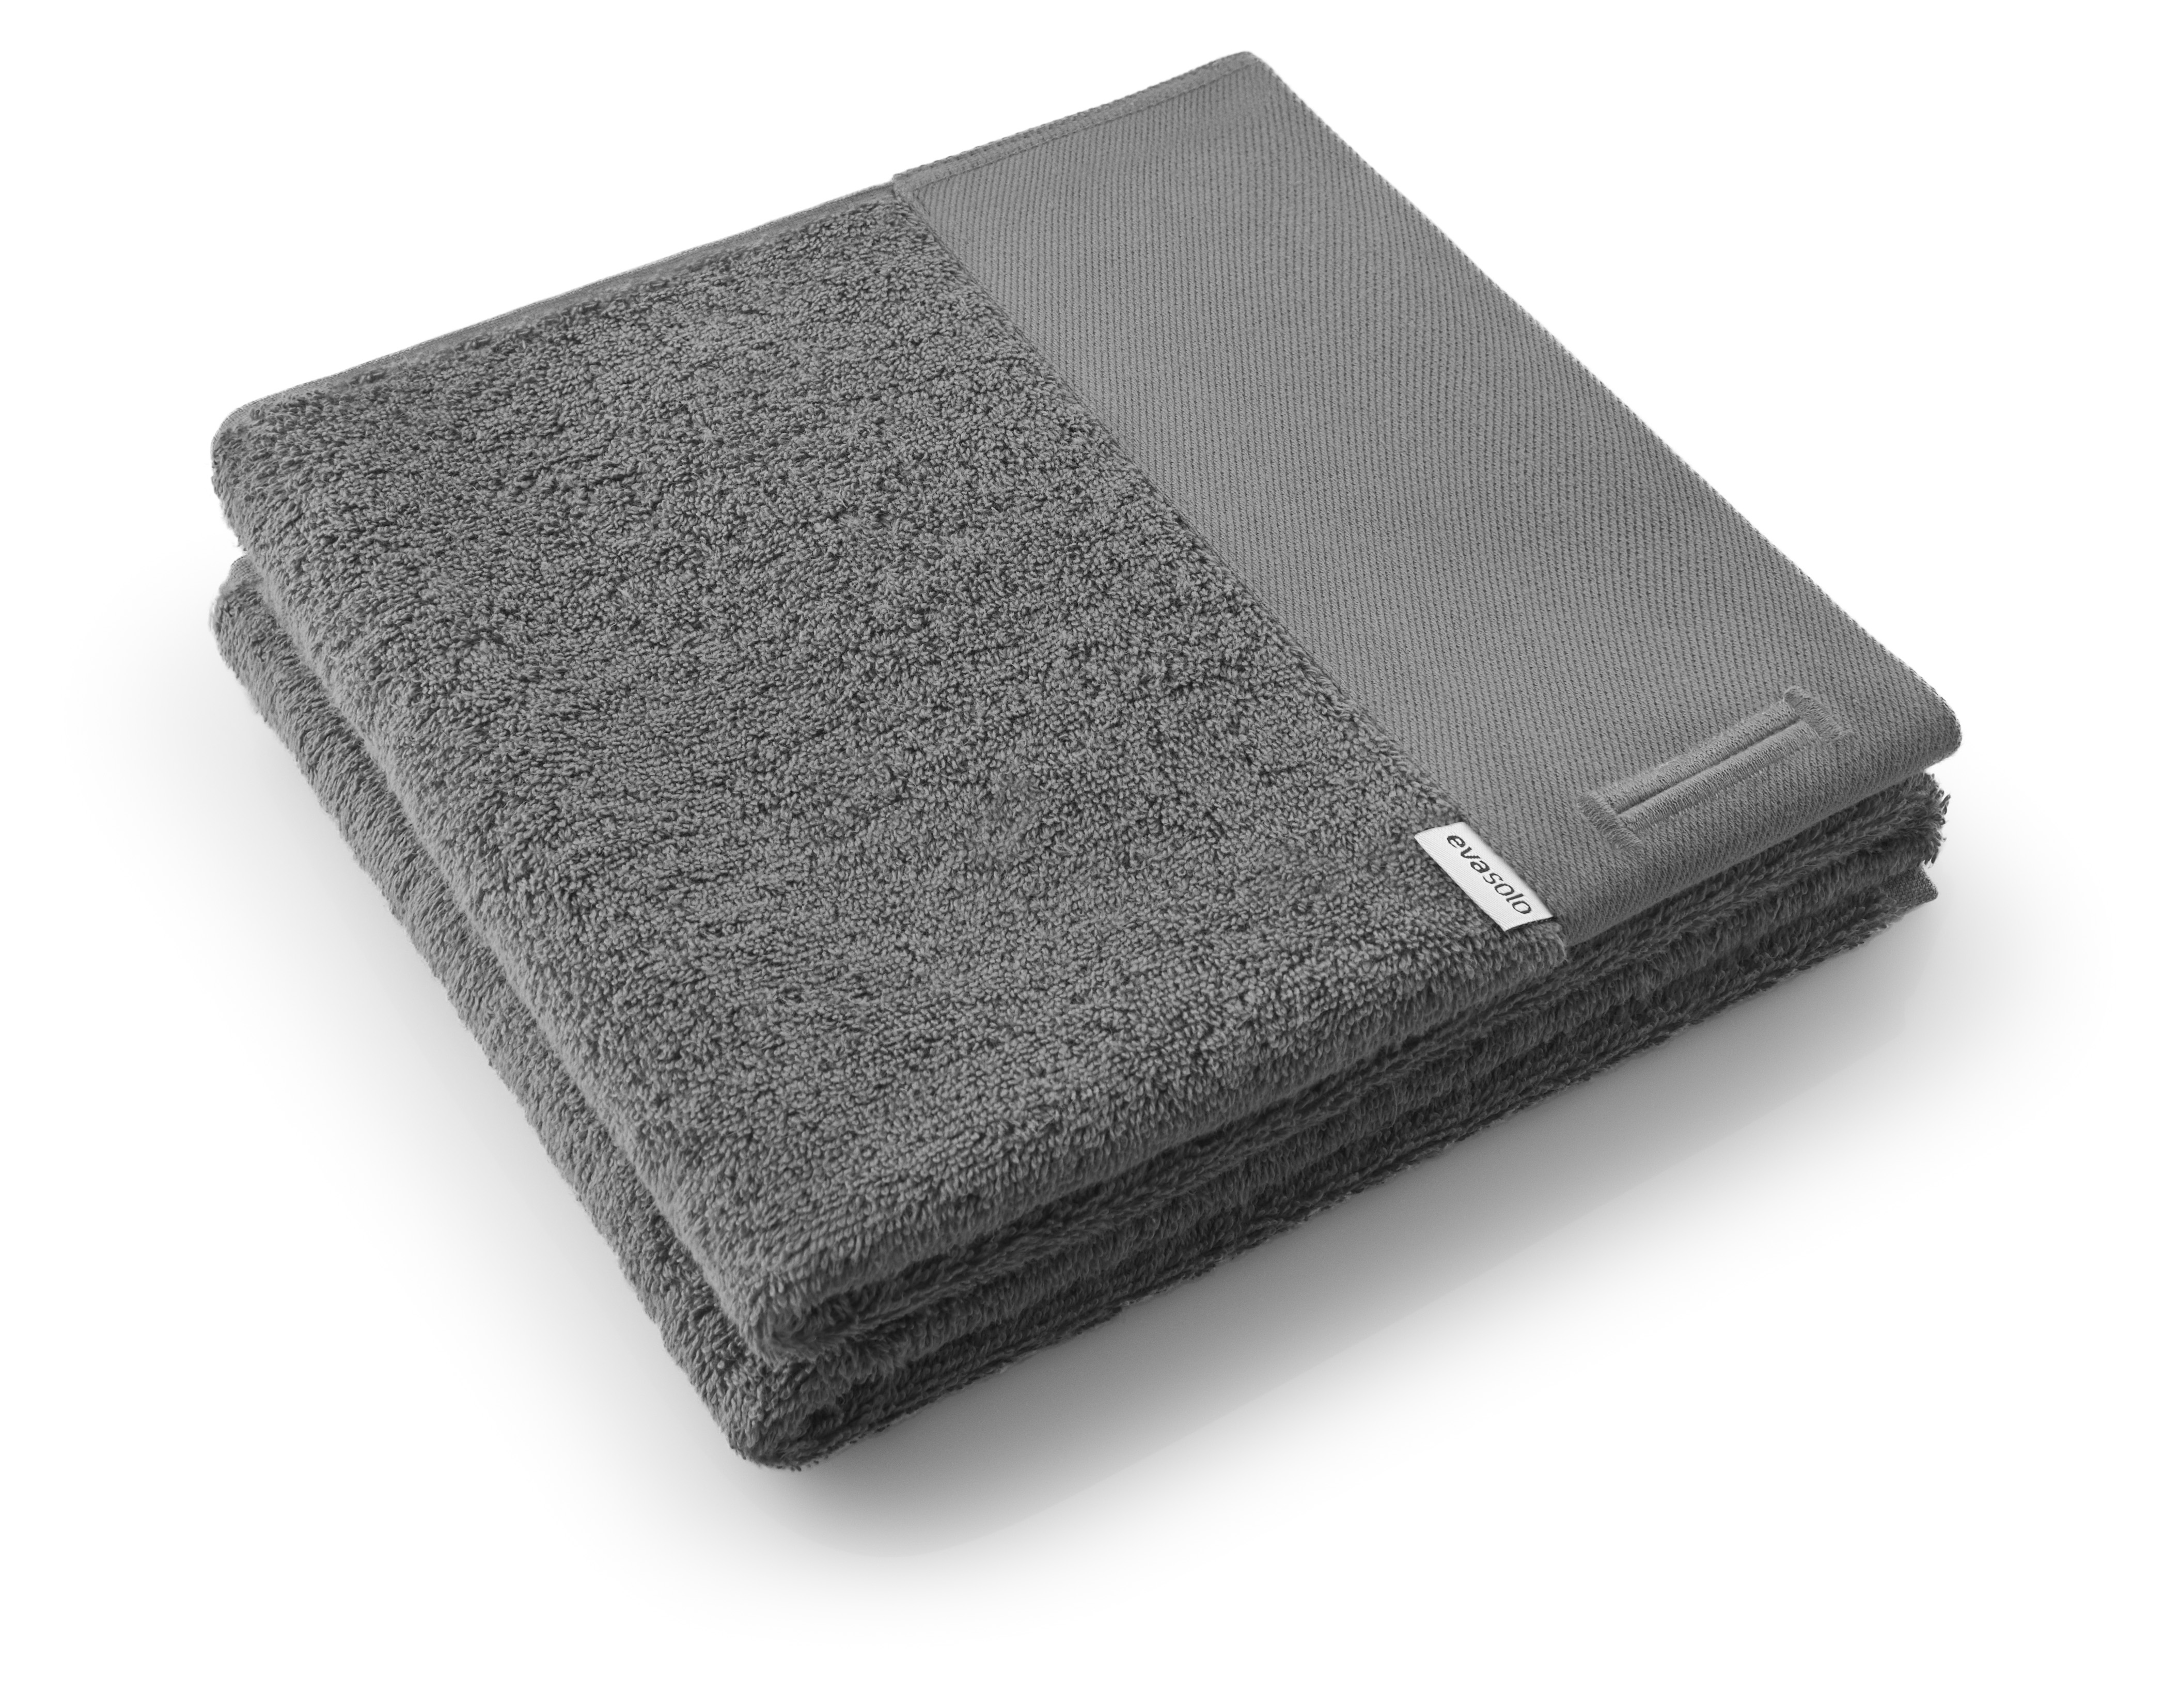 Eva Solo - Håndklæde 50 x 100 cm - Mørk Grå